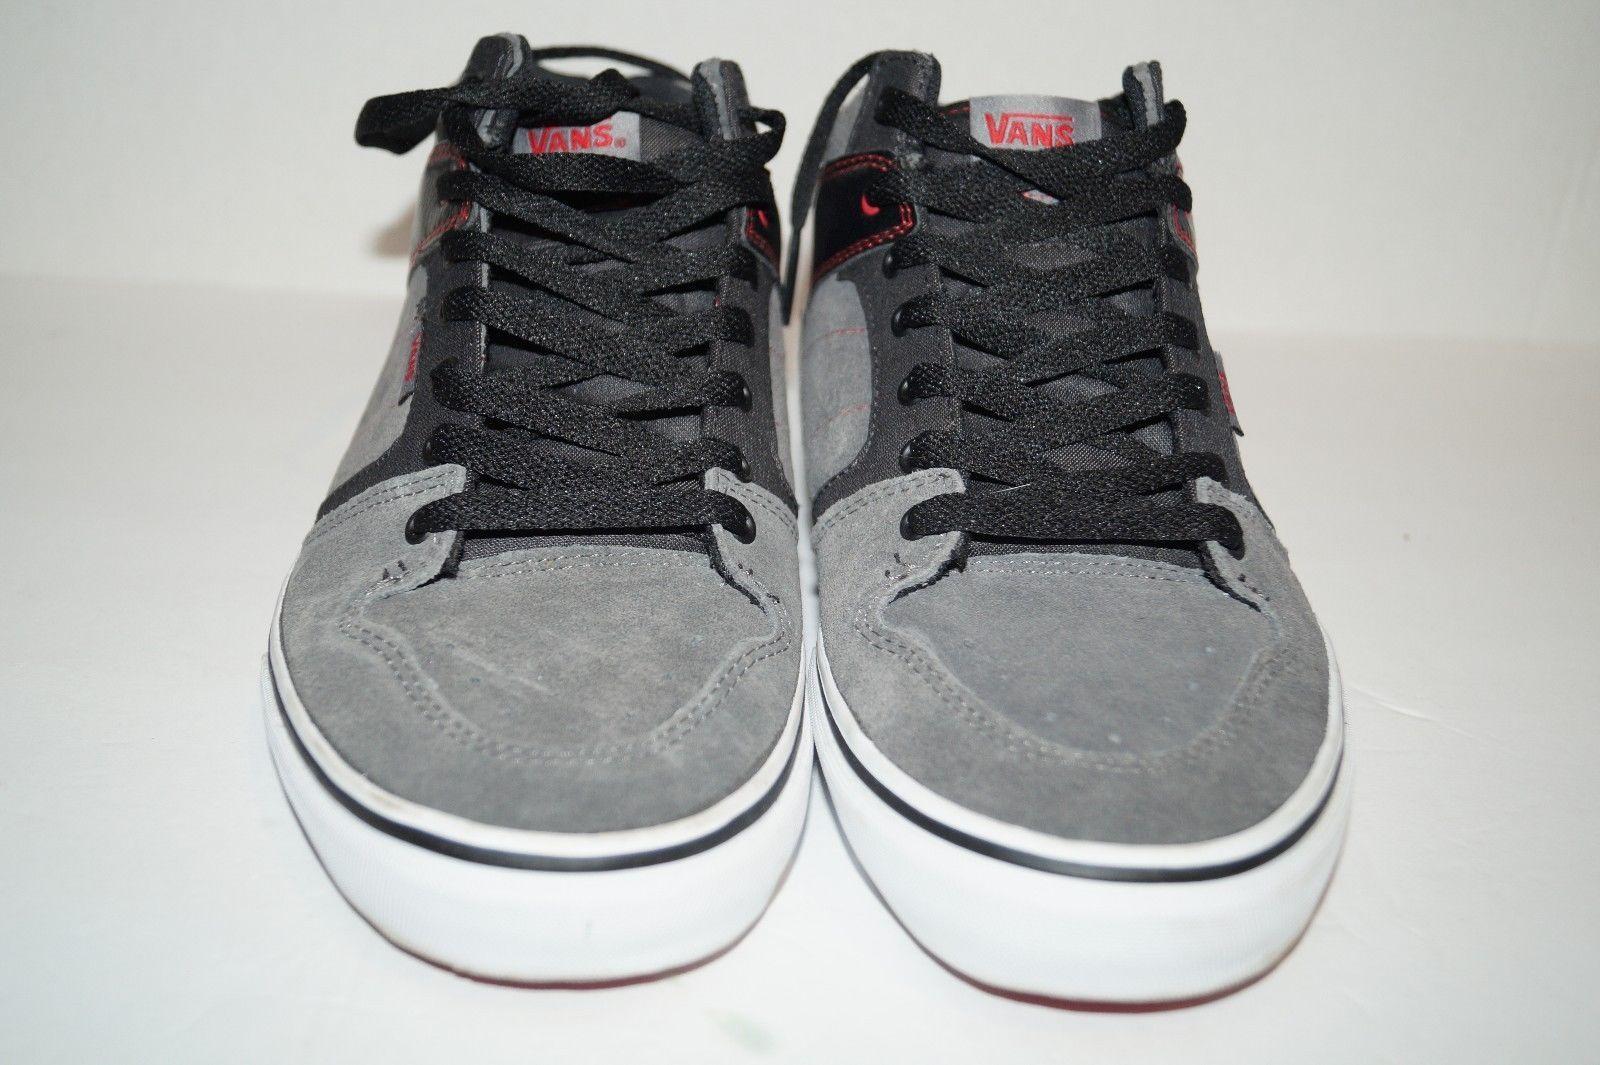 85218409f5 VANS Vulcanized Mid Top Shoes Mens Suede Canvas Skate Size 8.5